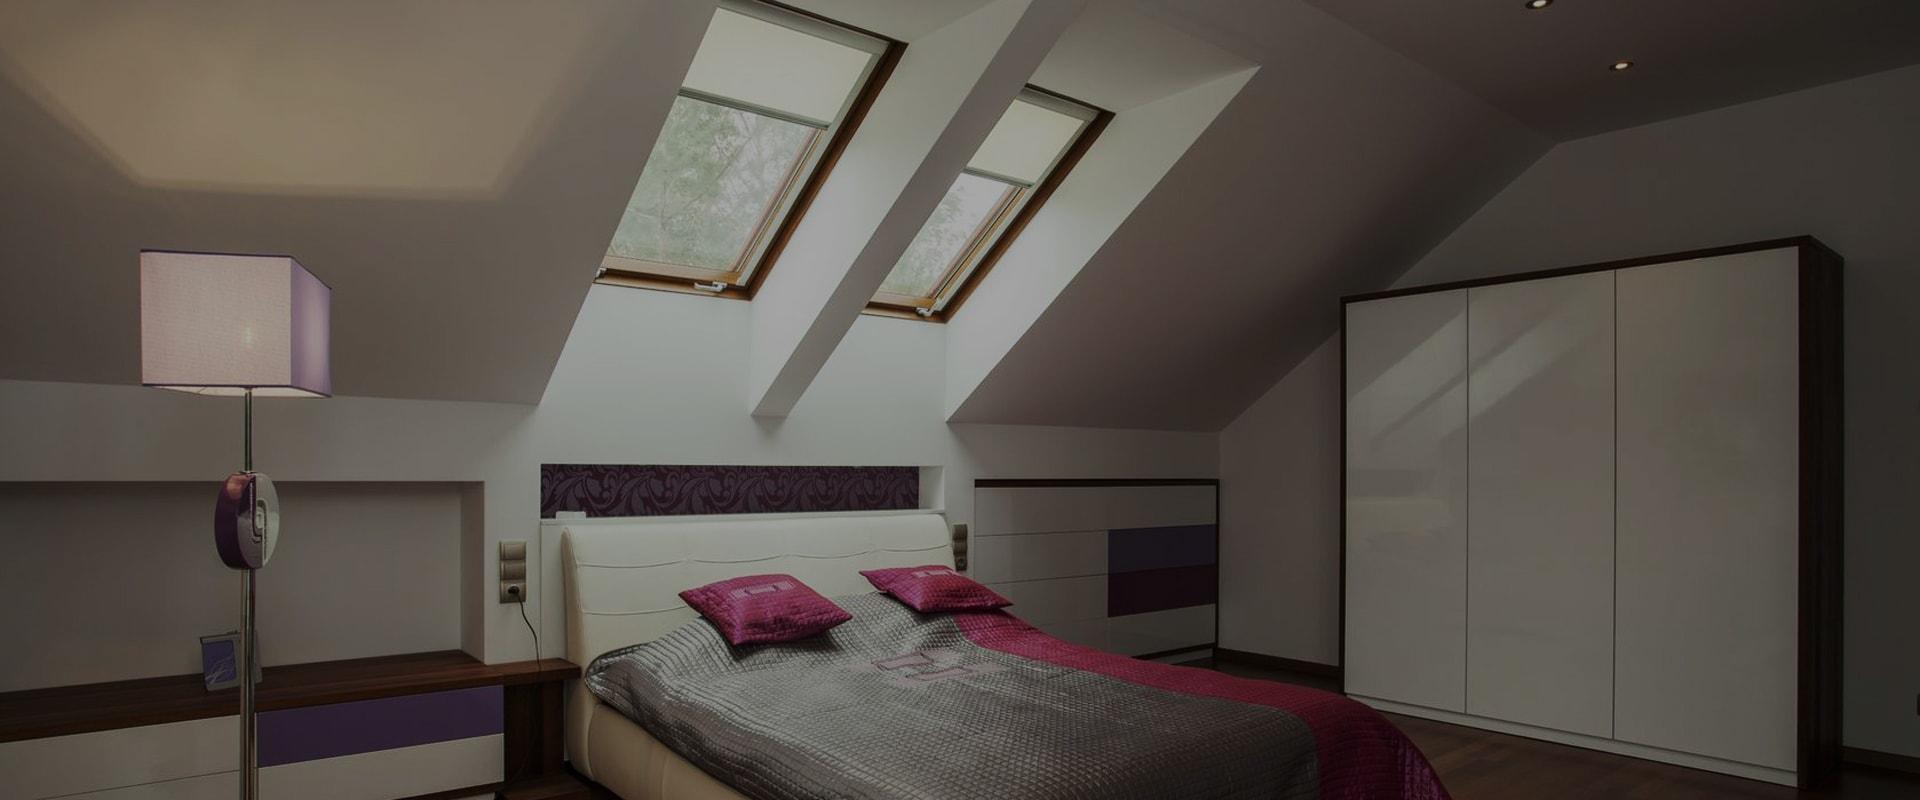 loft conversions bradford